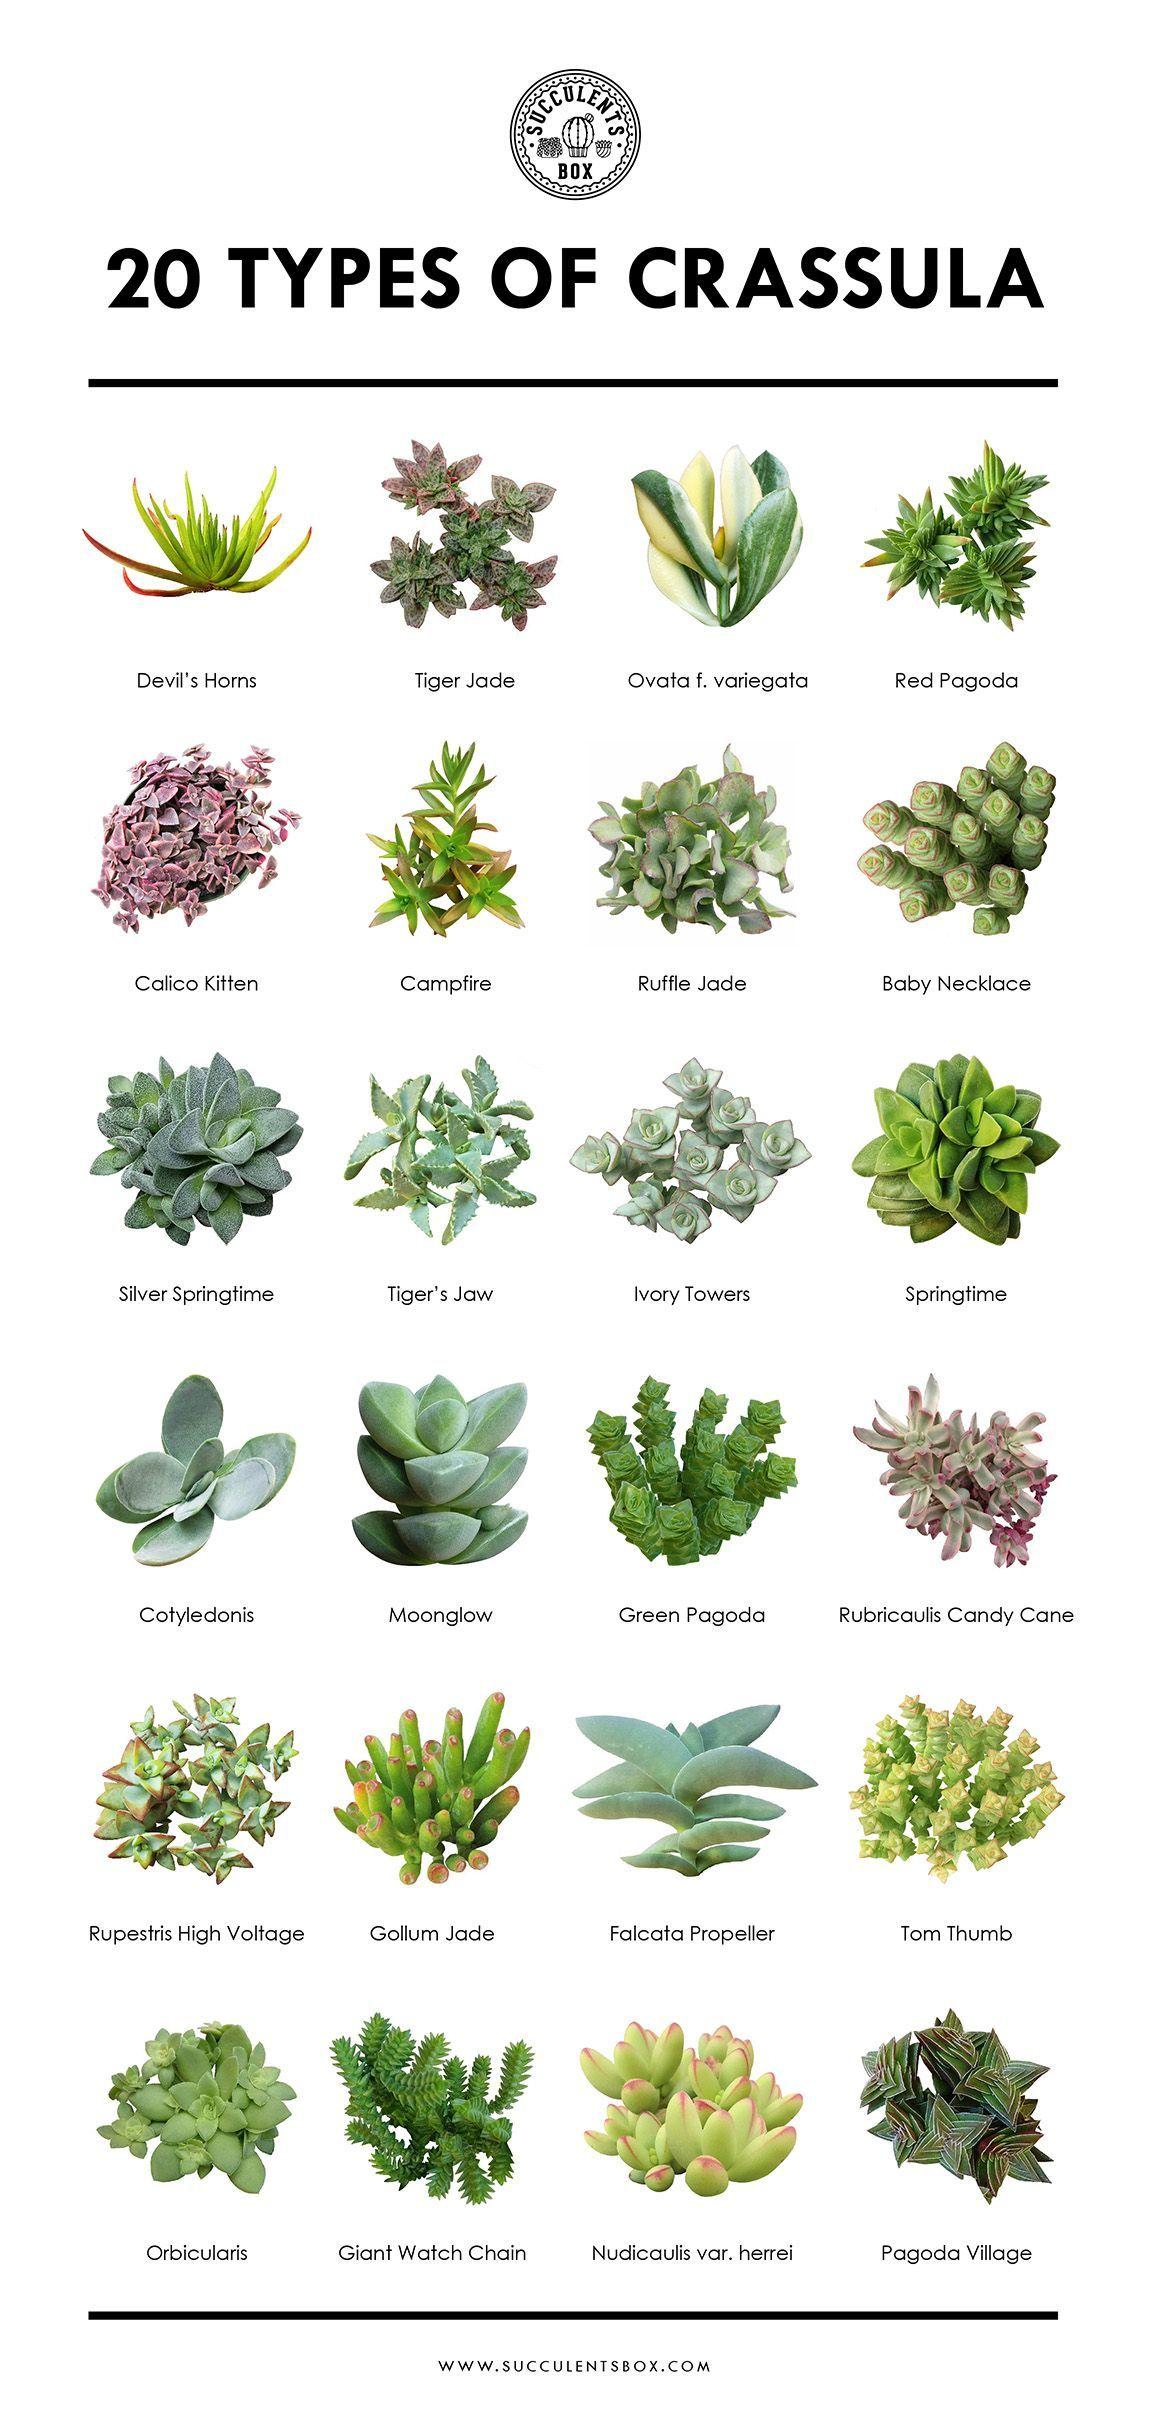 20 Tipos De Crassula With Images Types Of Succulents Plants